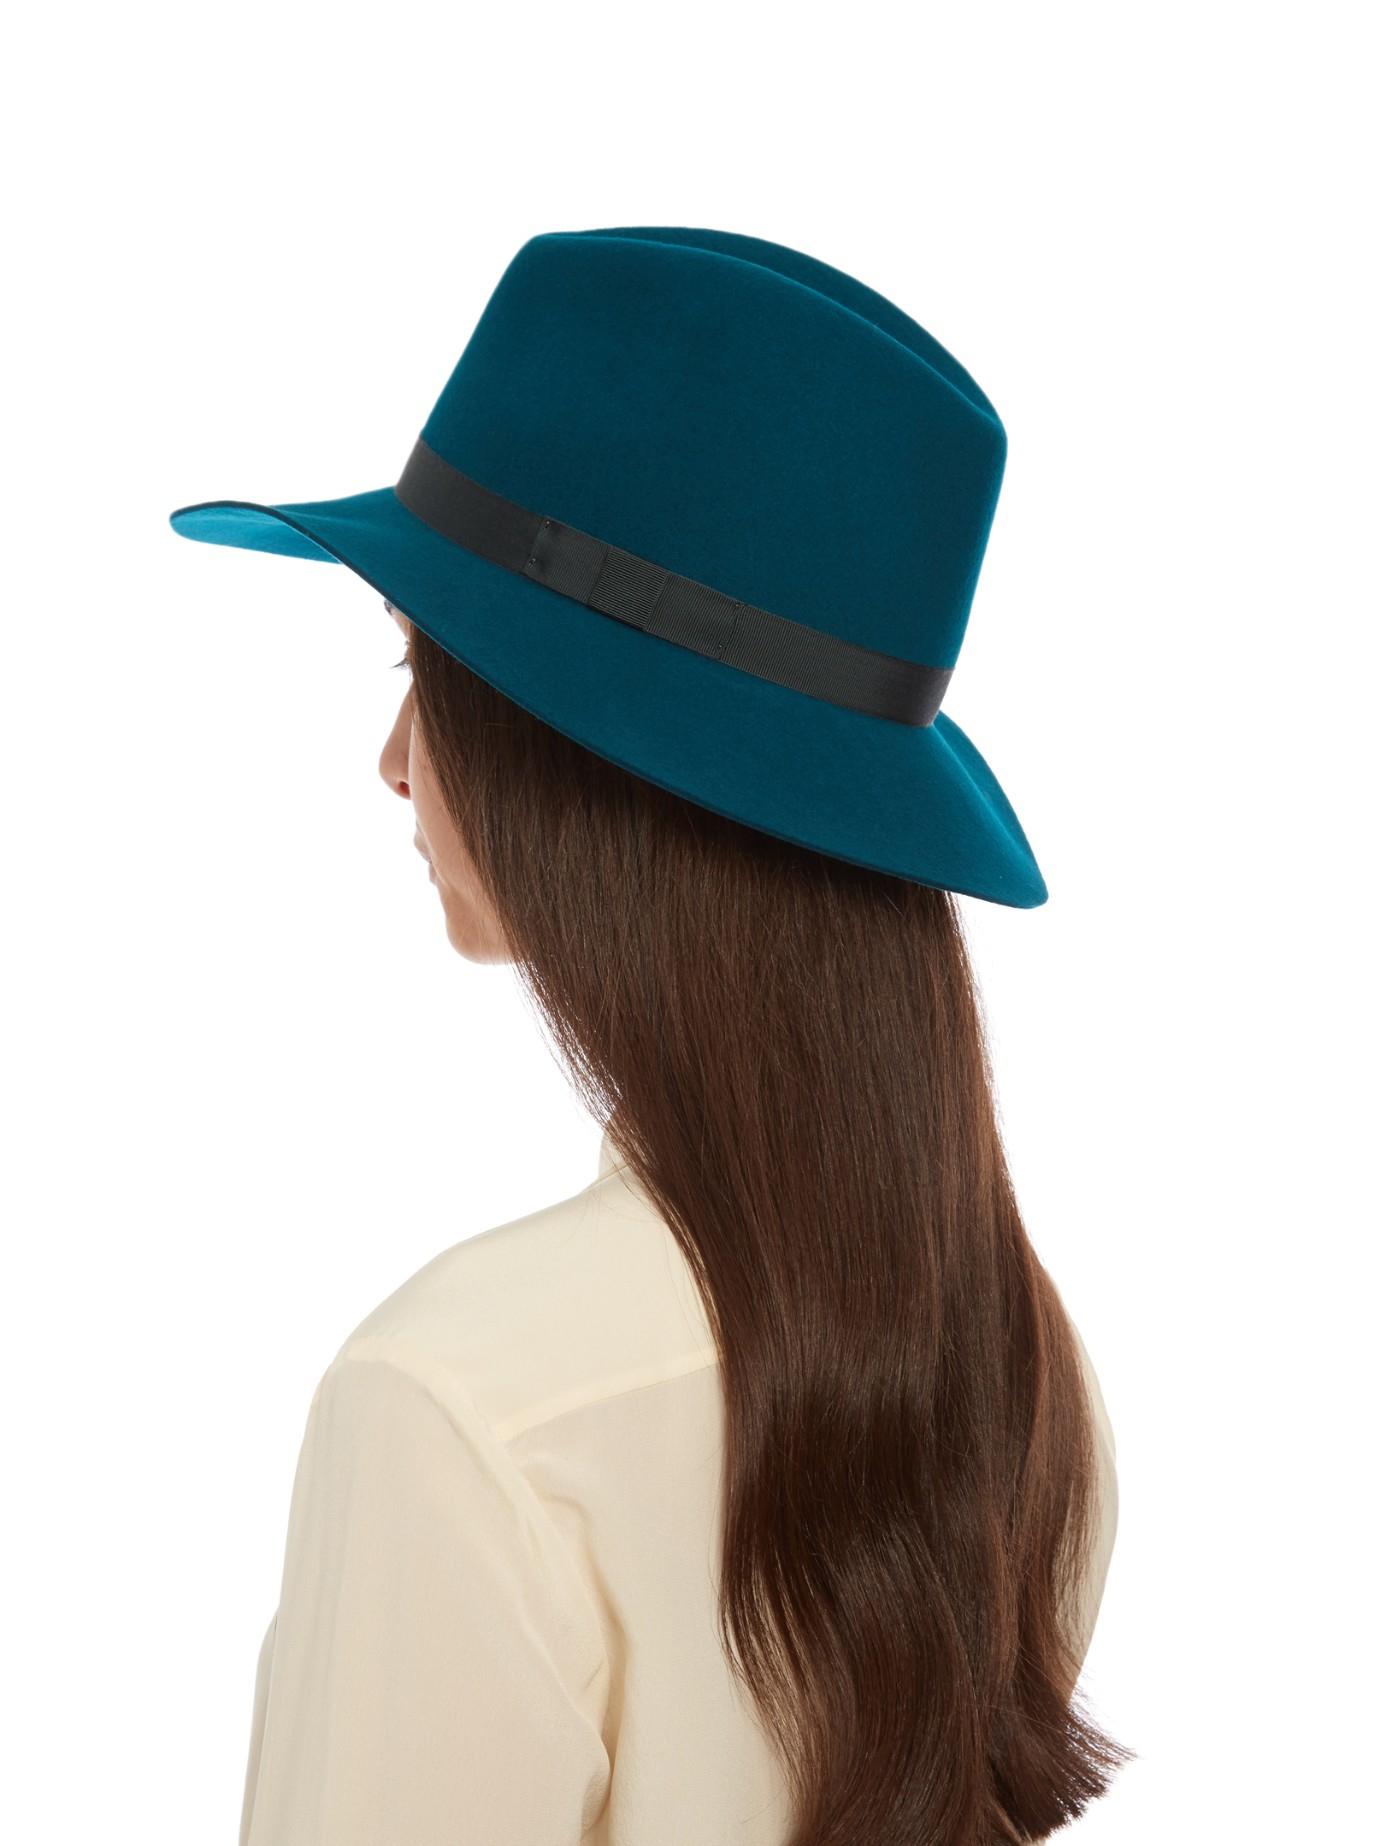 7e5d036c3 Rag & Bone Green Floppy Brim Wool-felt Fedora Hat